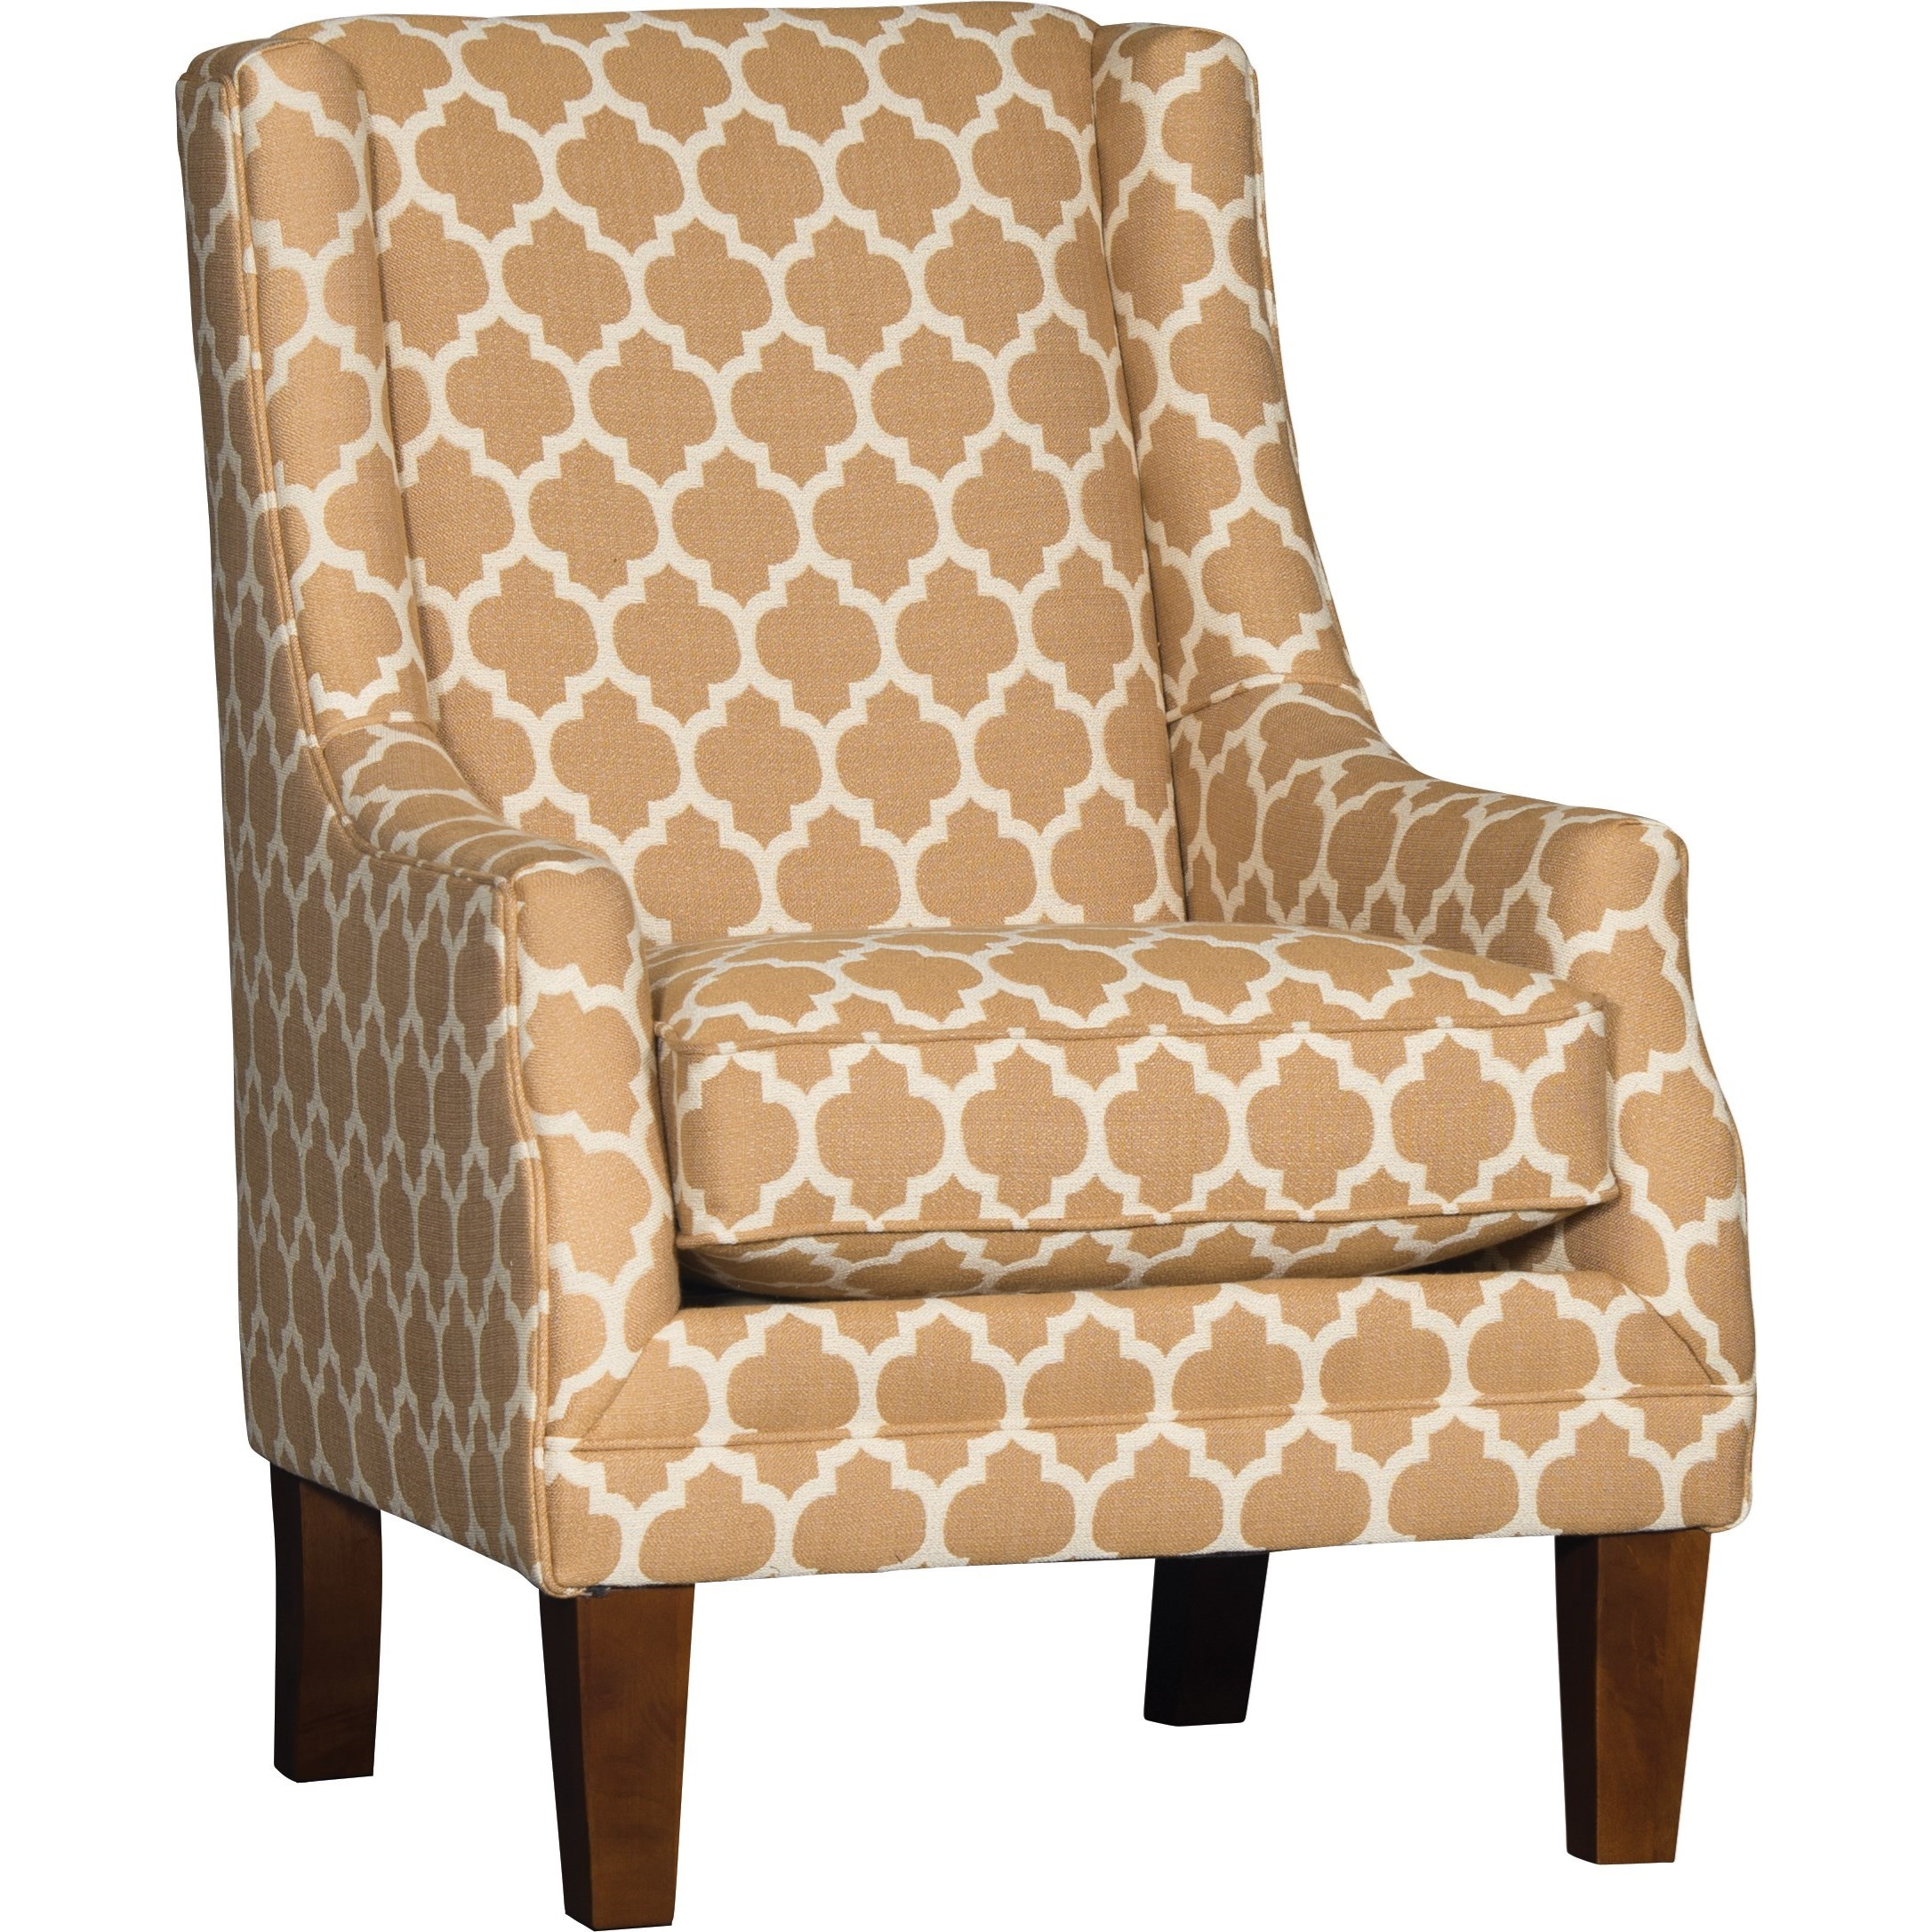 9820 Chair by Mayo at Pedigo Furniture